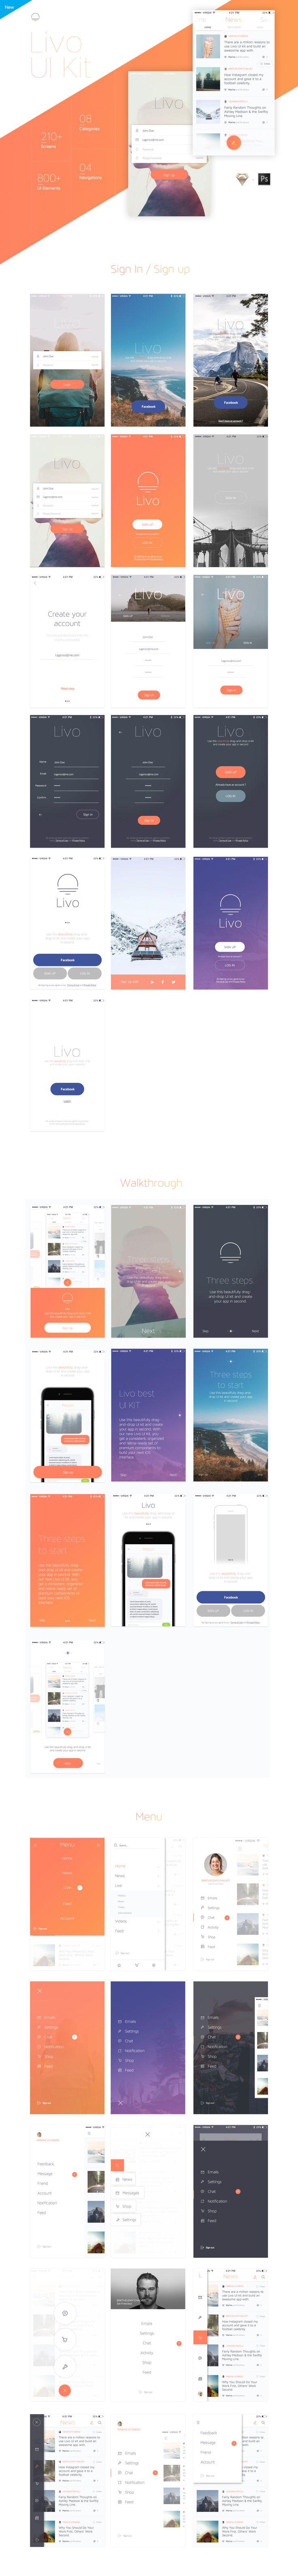 Livo UI Kit by AgenceMe on Creative Market